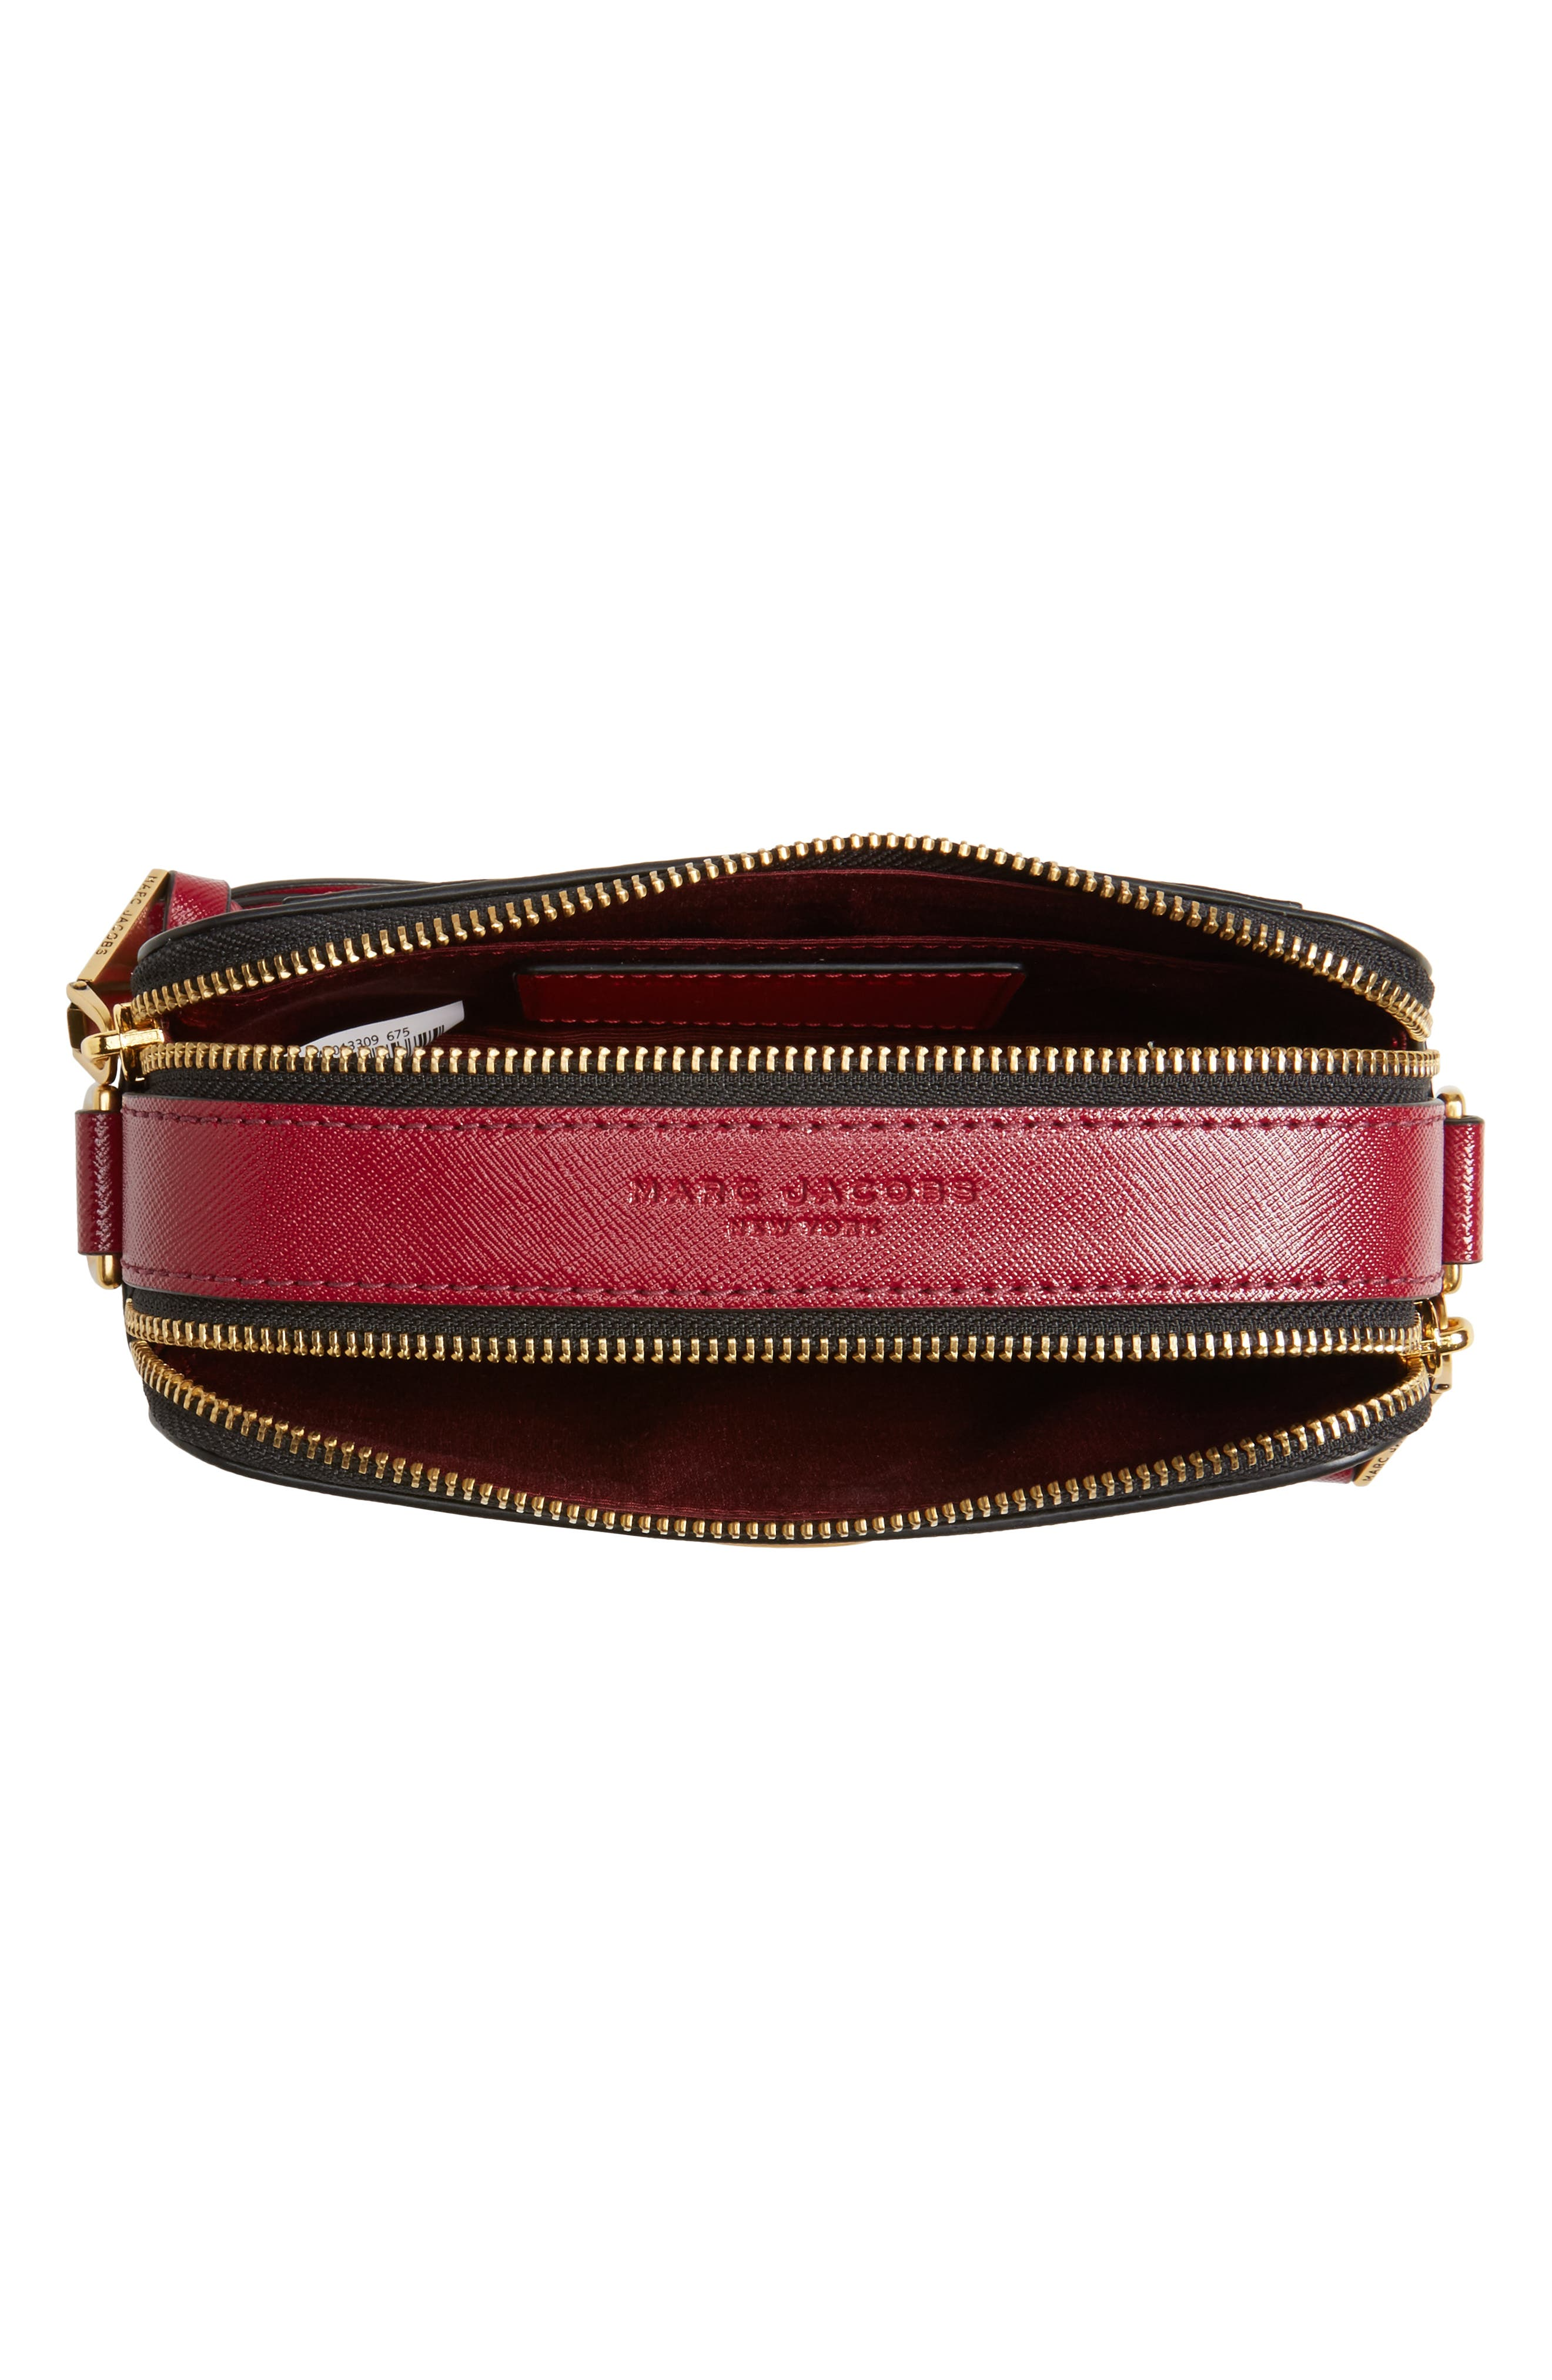 Snapshot Printed Lips Leather Crossbody Bag,                             Alternate thumbnail 4, color,                             675